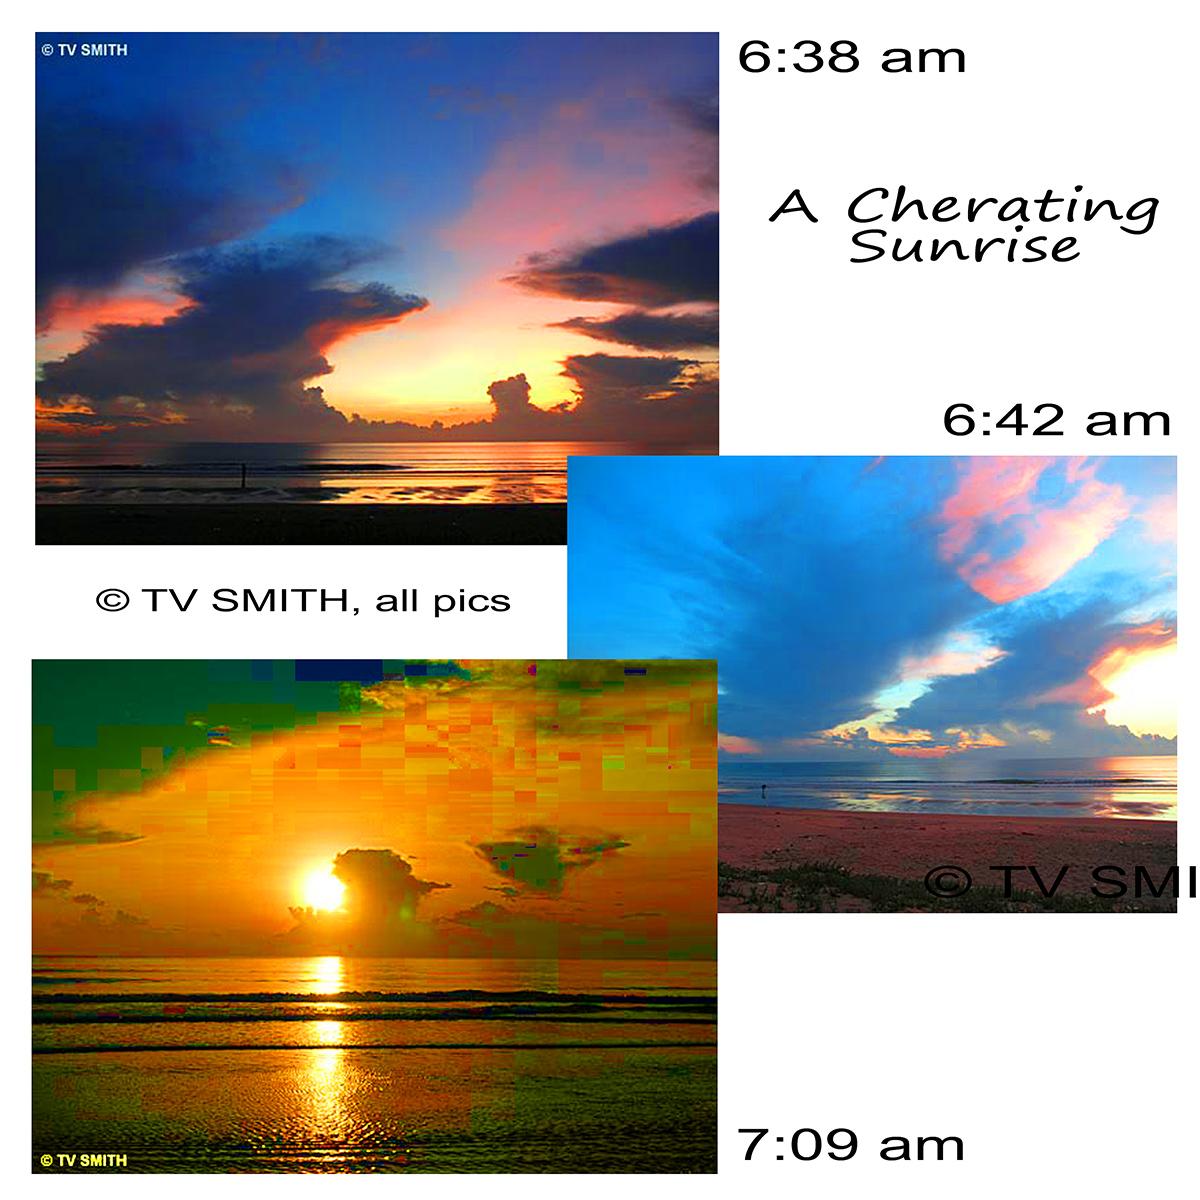 A Cherating Sunrise